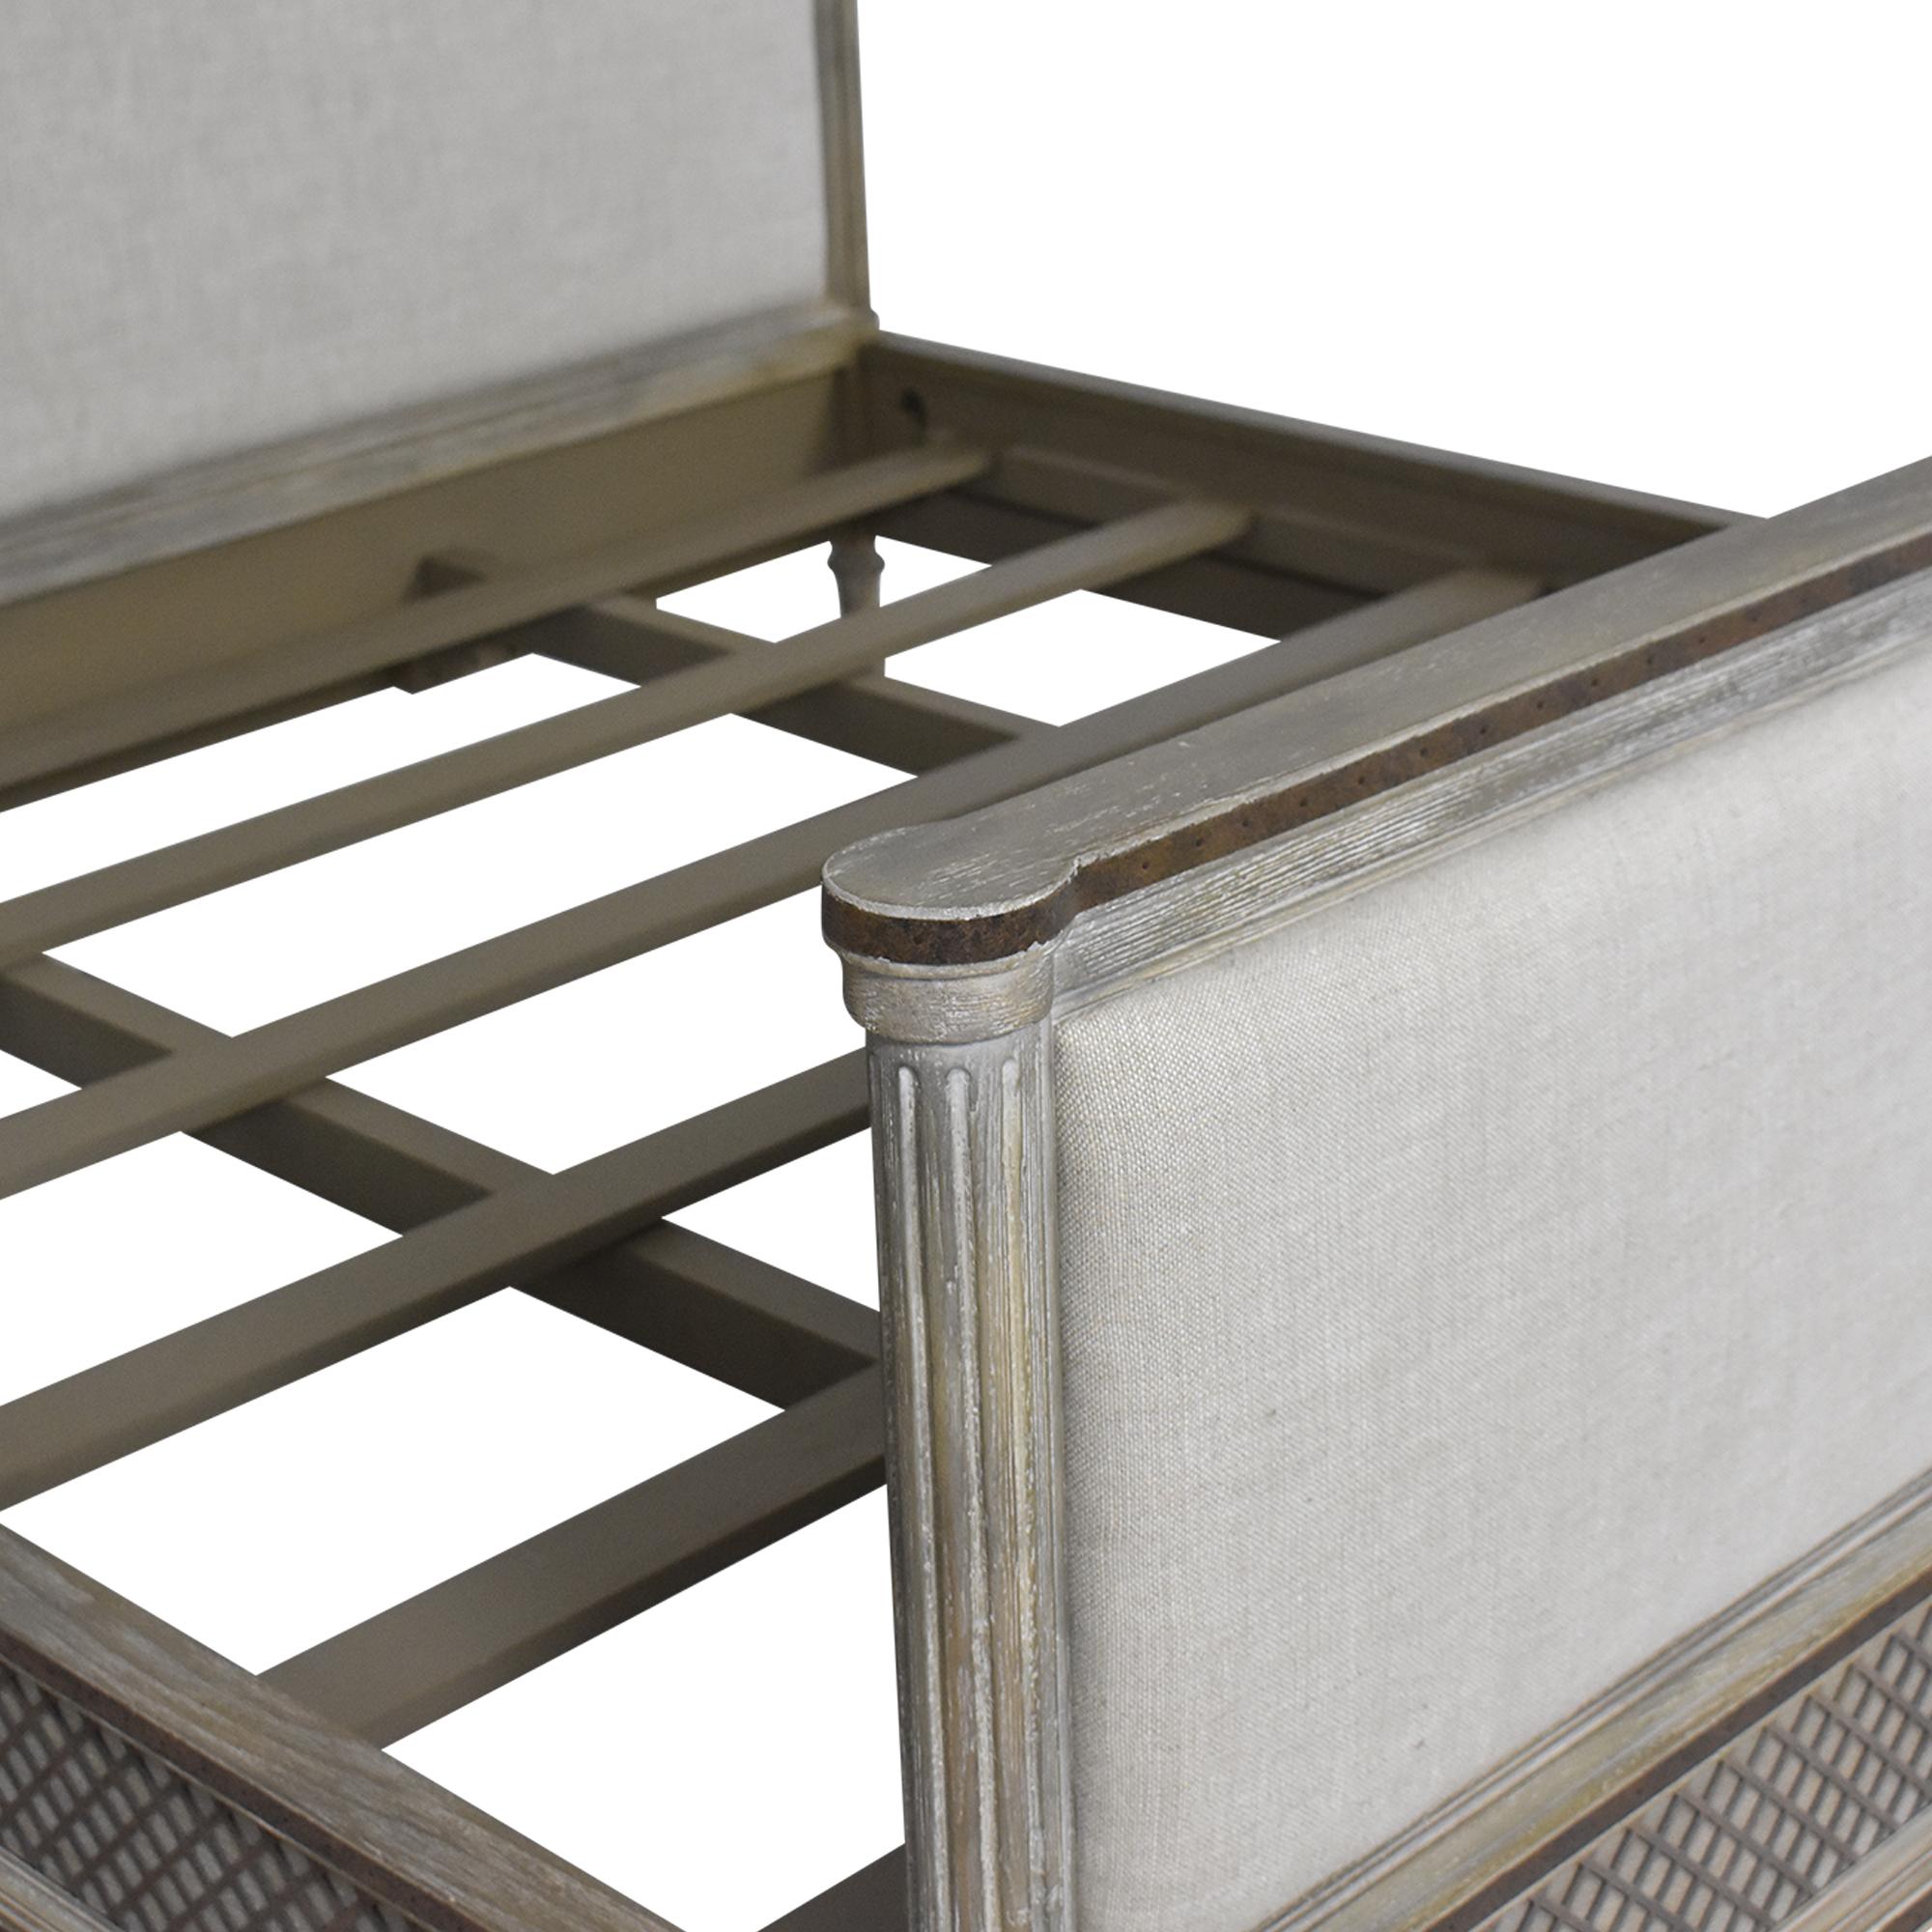 Restoration Hardware Restoration Hardware Louis XVI Treillage King Bed used